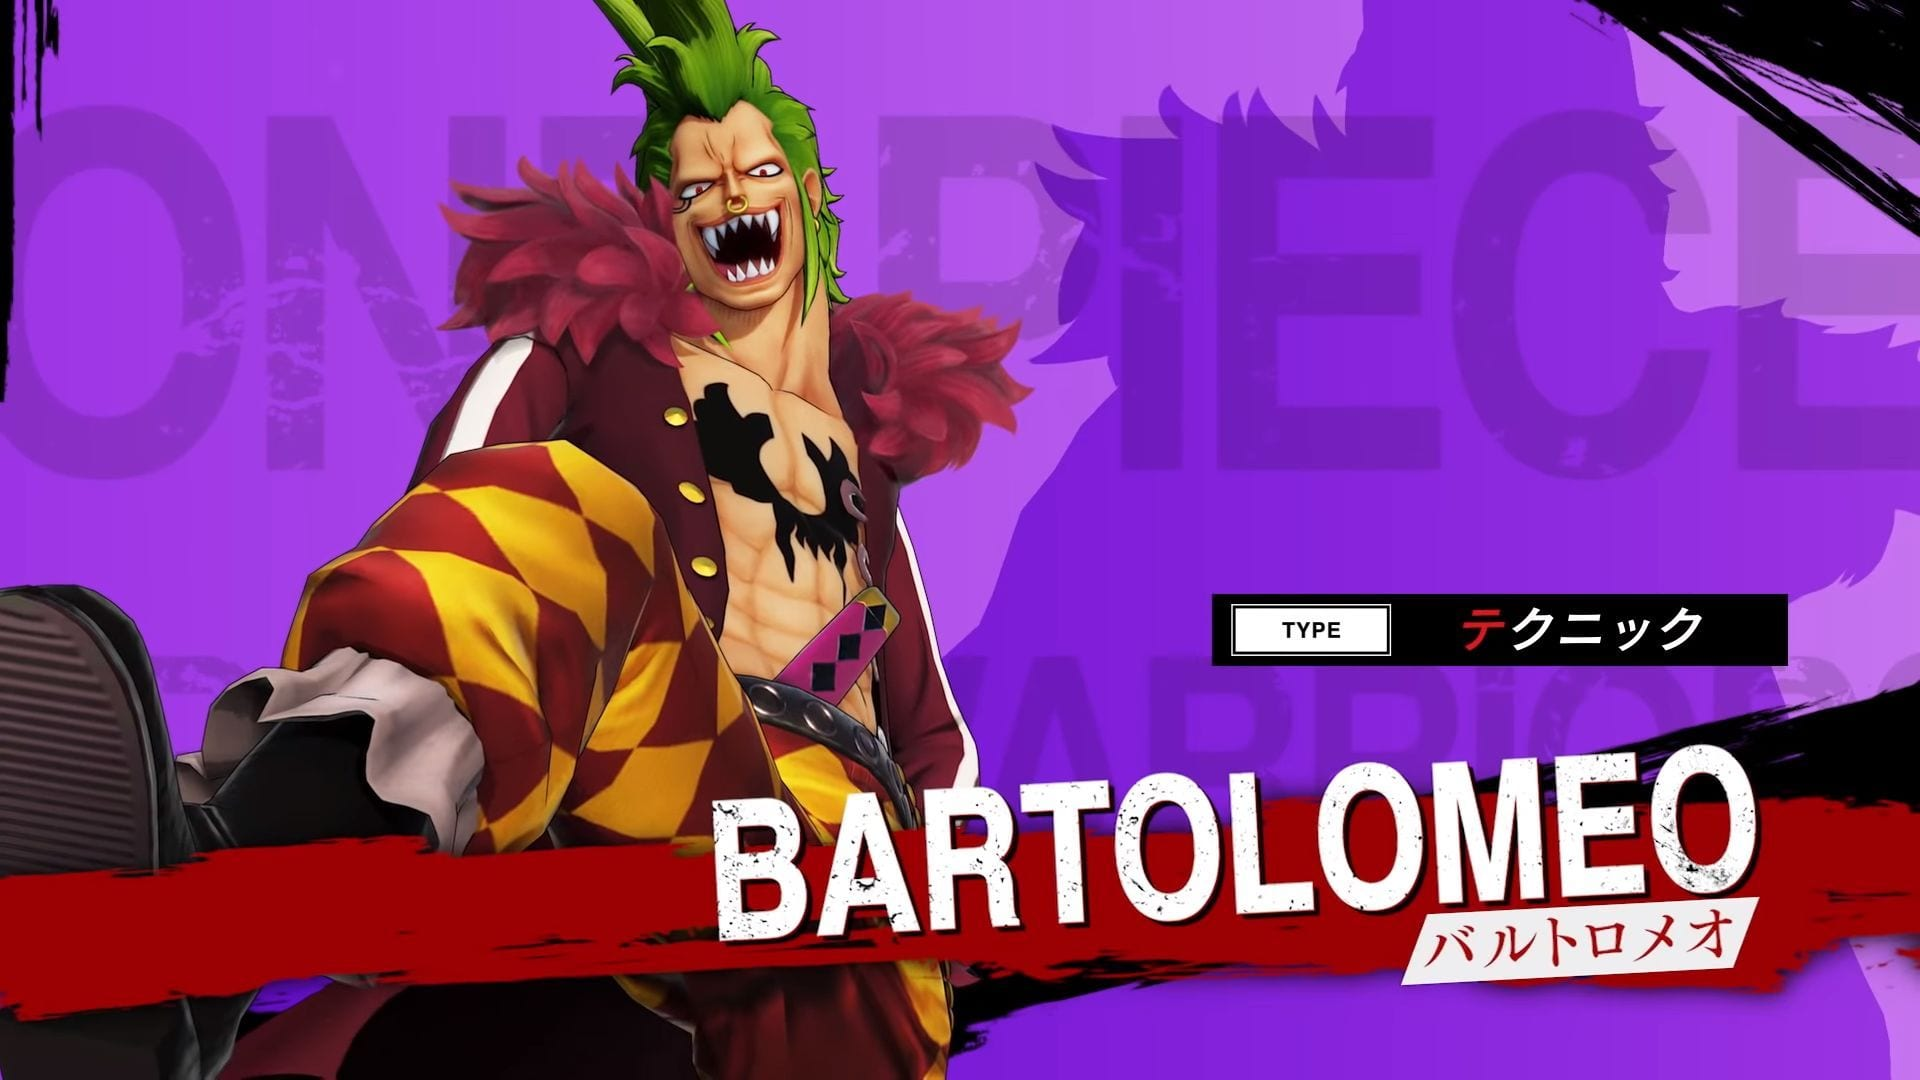 One Piece: Pirate Warriors 4 Bartolomeo